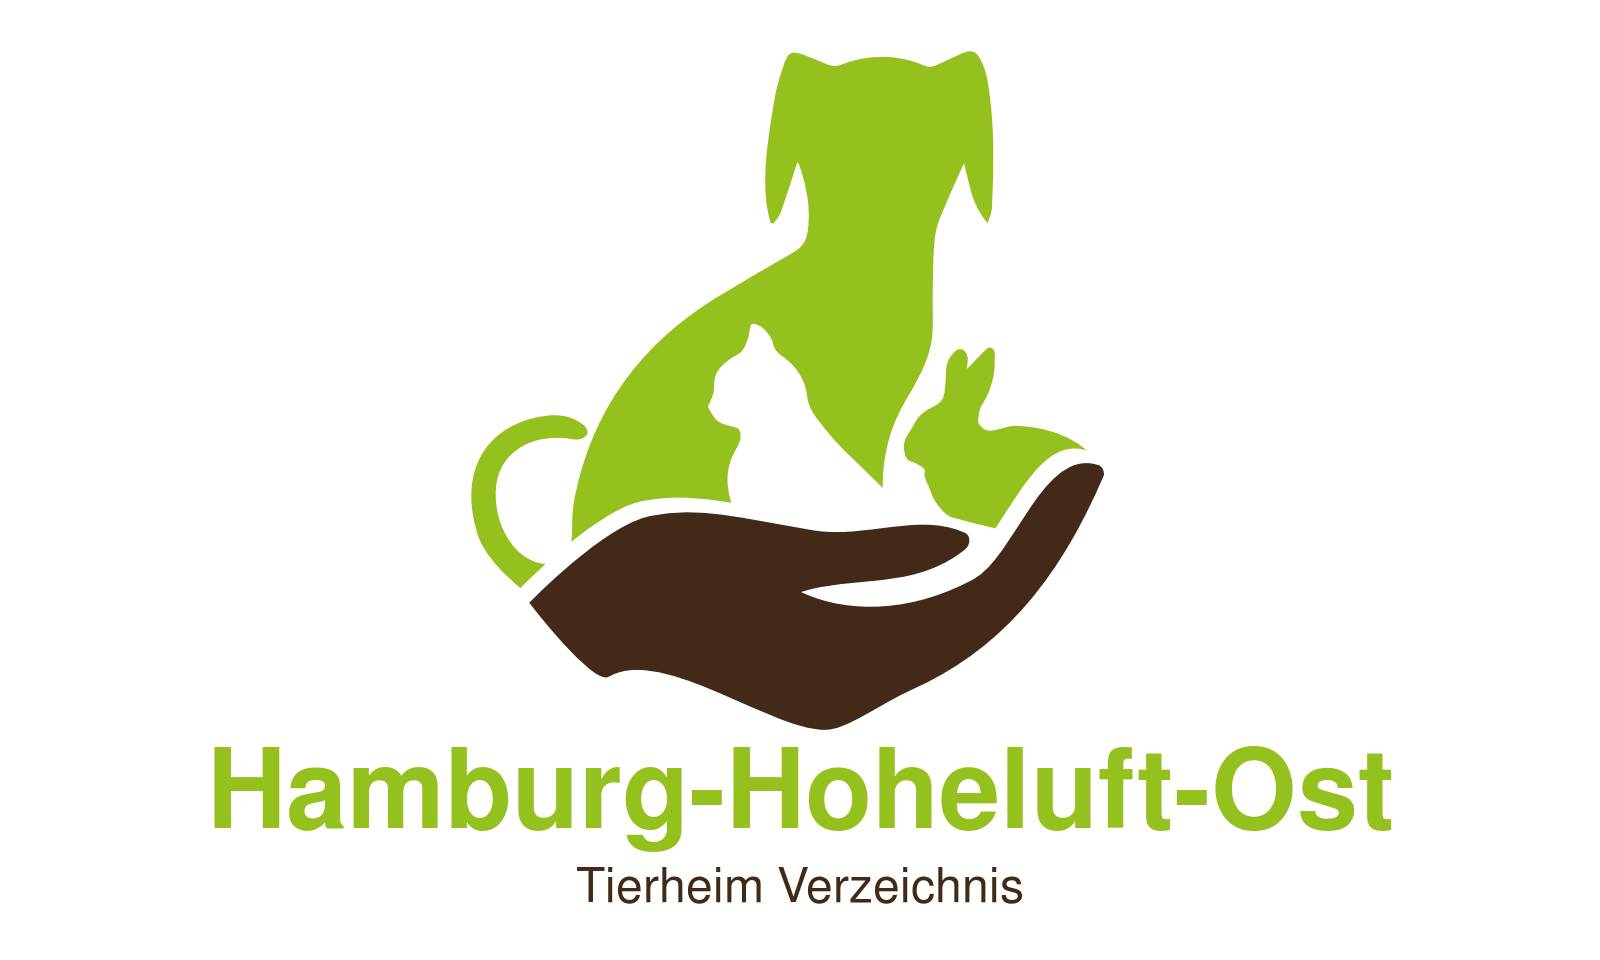 Tierheim Hamburg Hoheluft-Ost